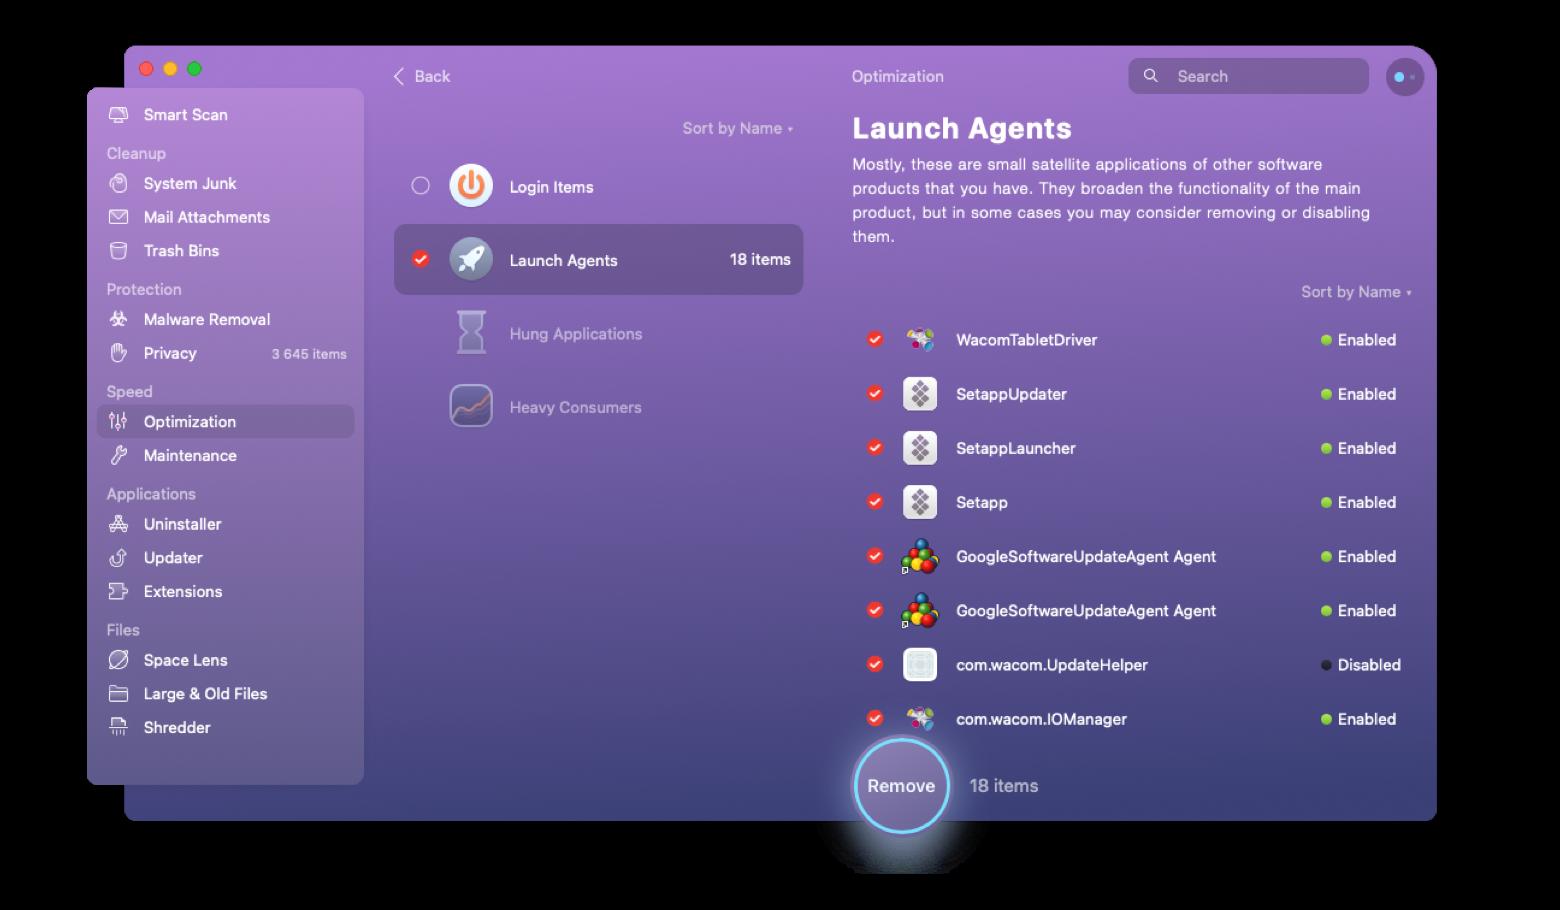 Launch agents